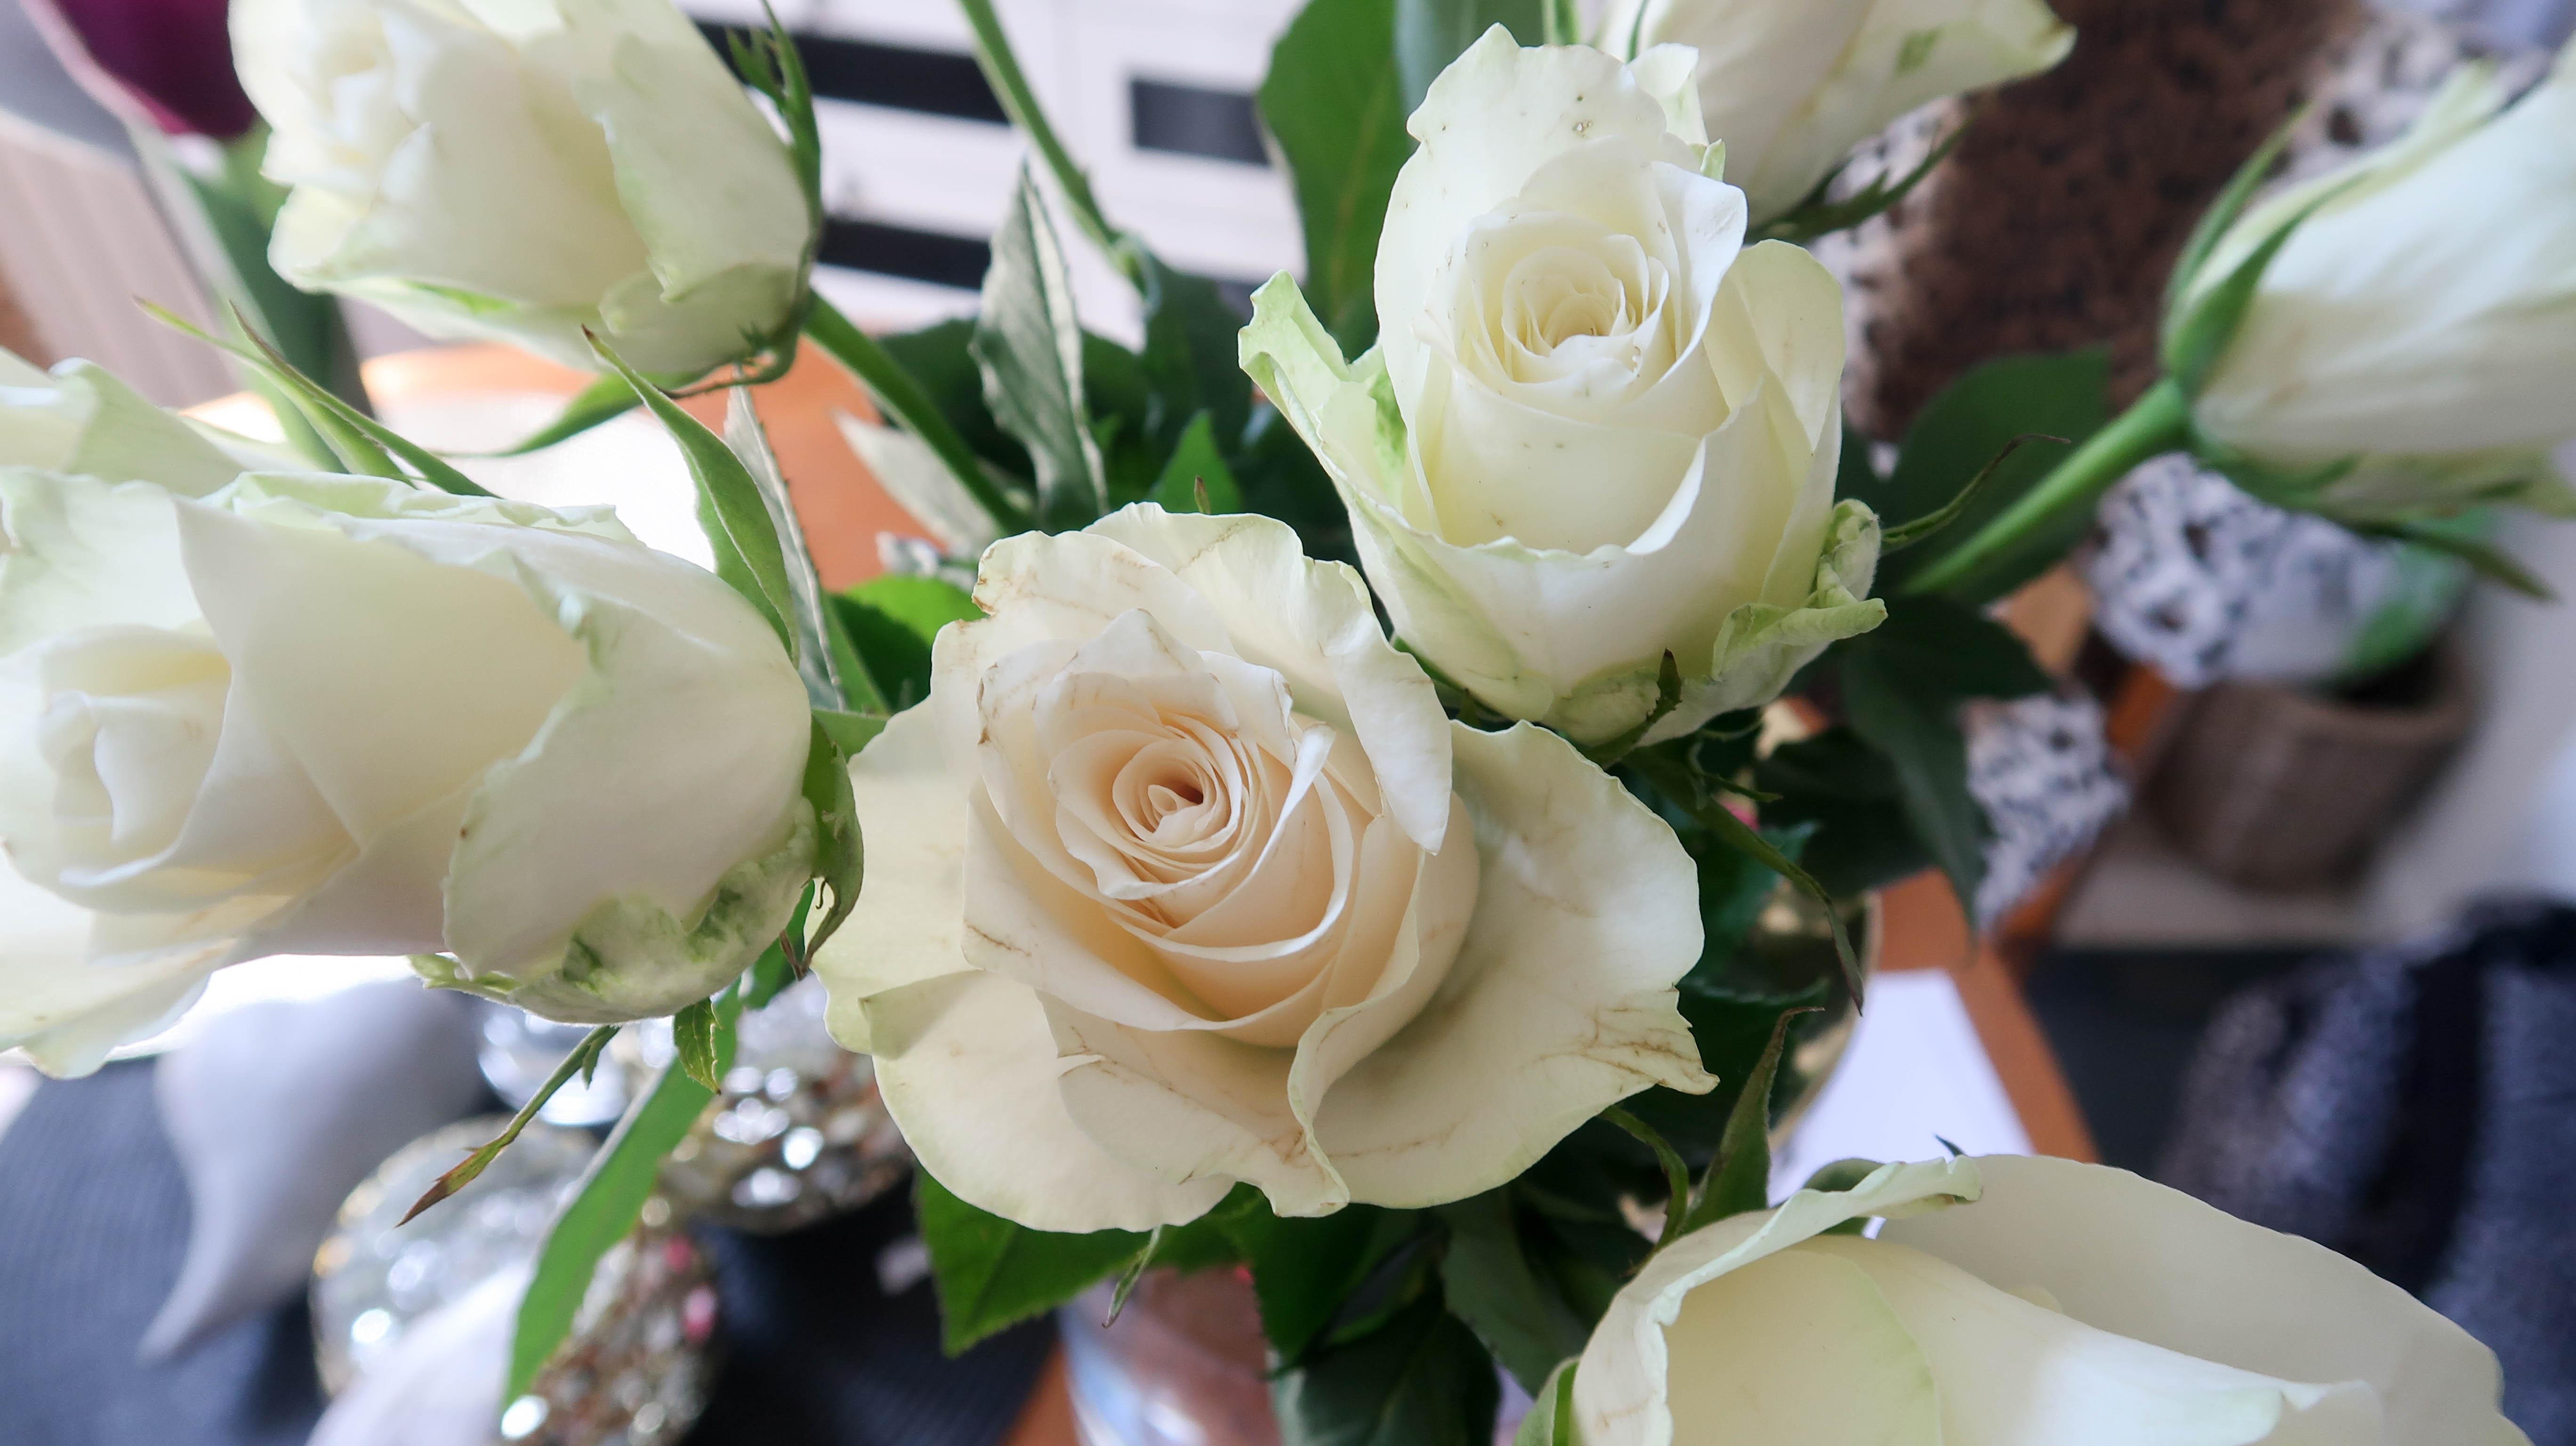 Jag fick lagledaren blommor 😂